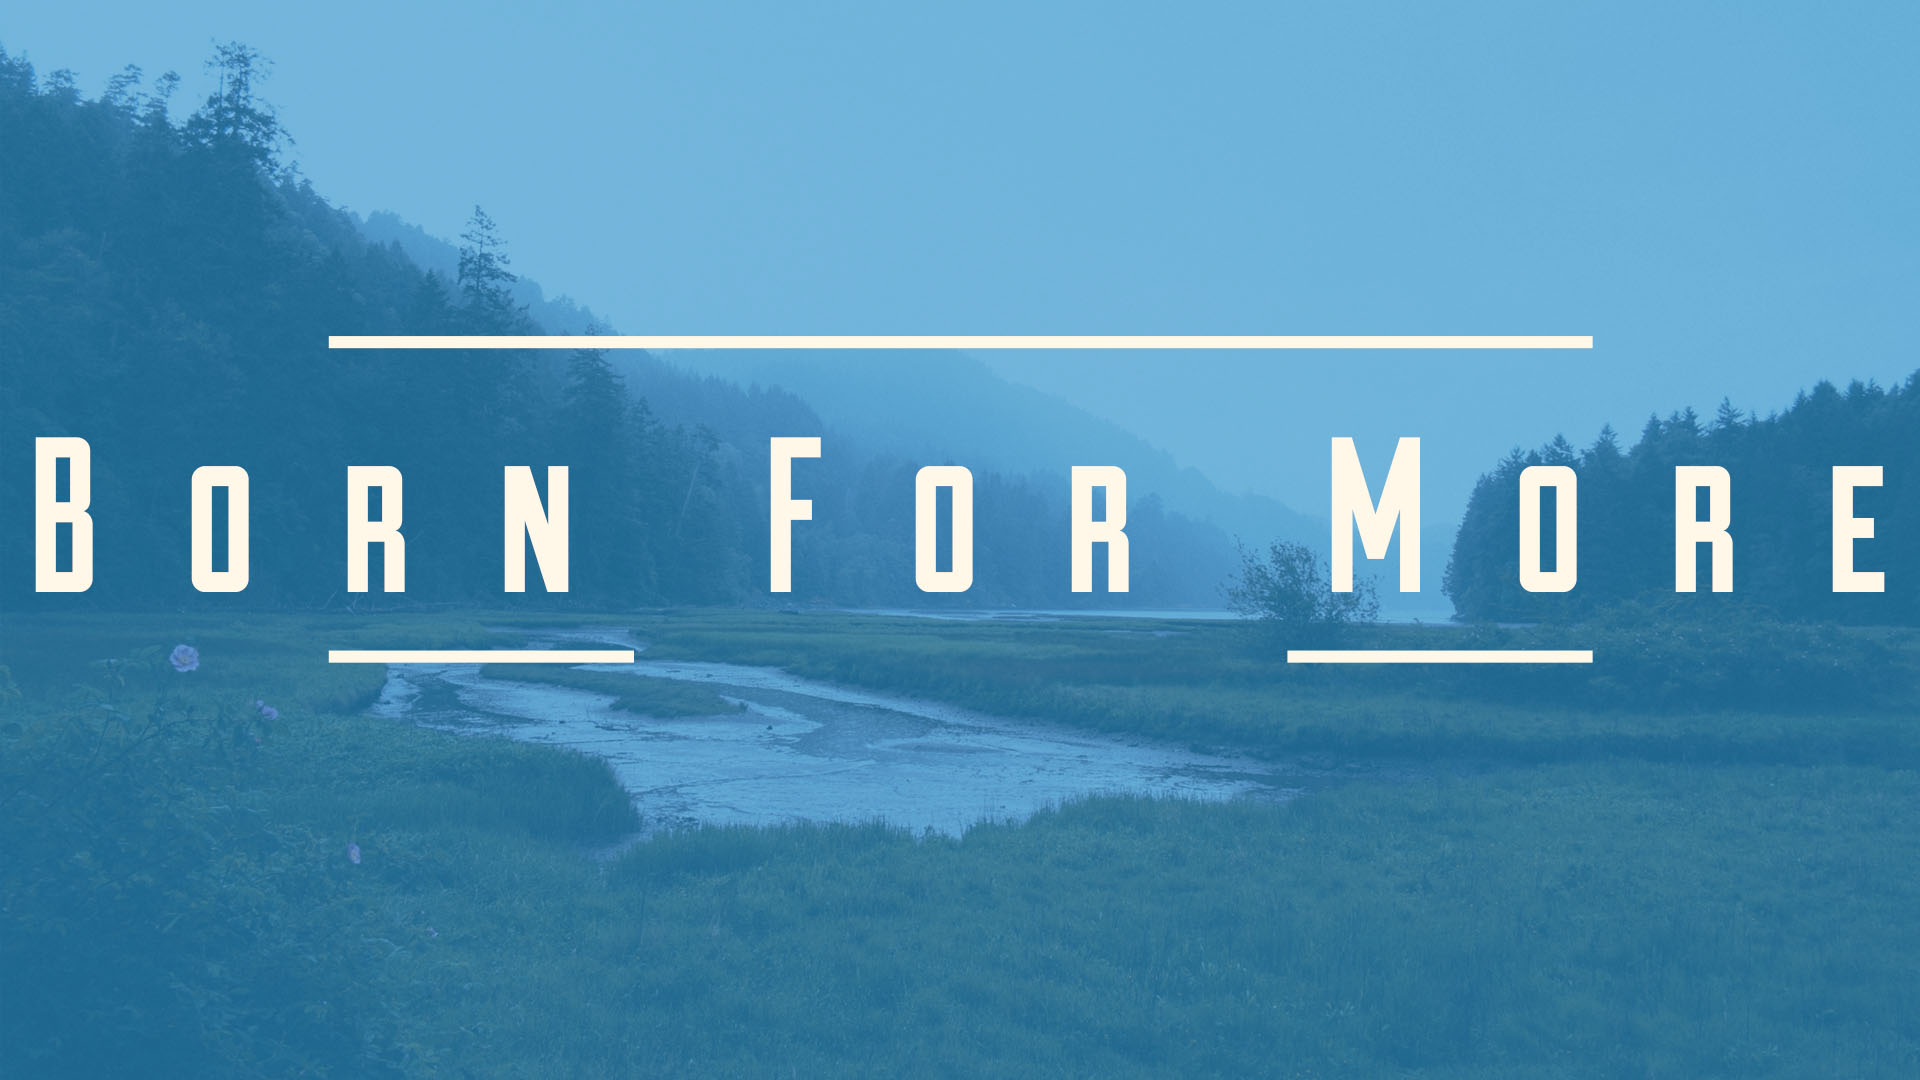 bornformore2.jpg